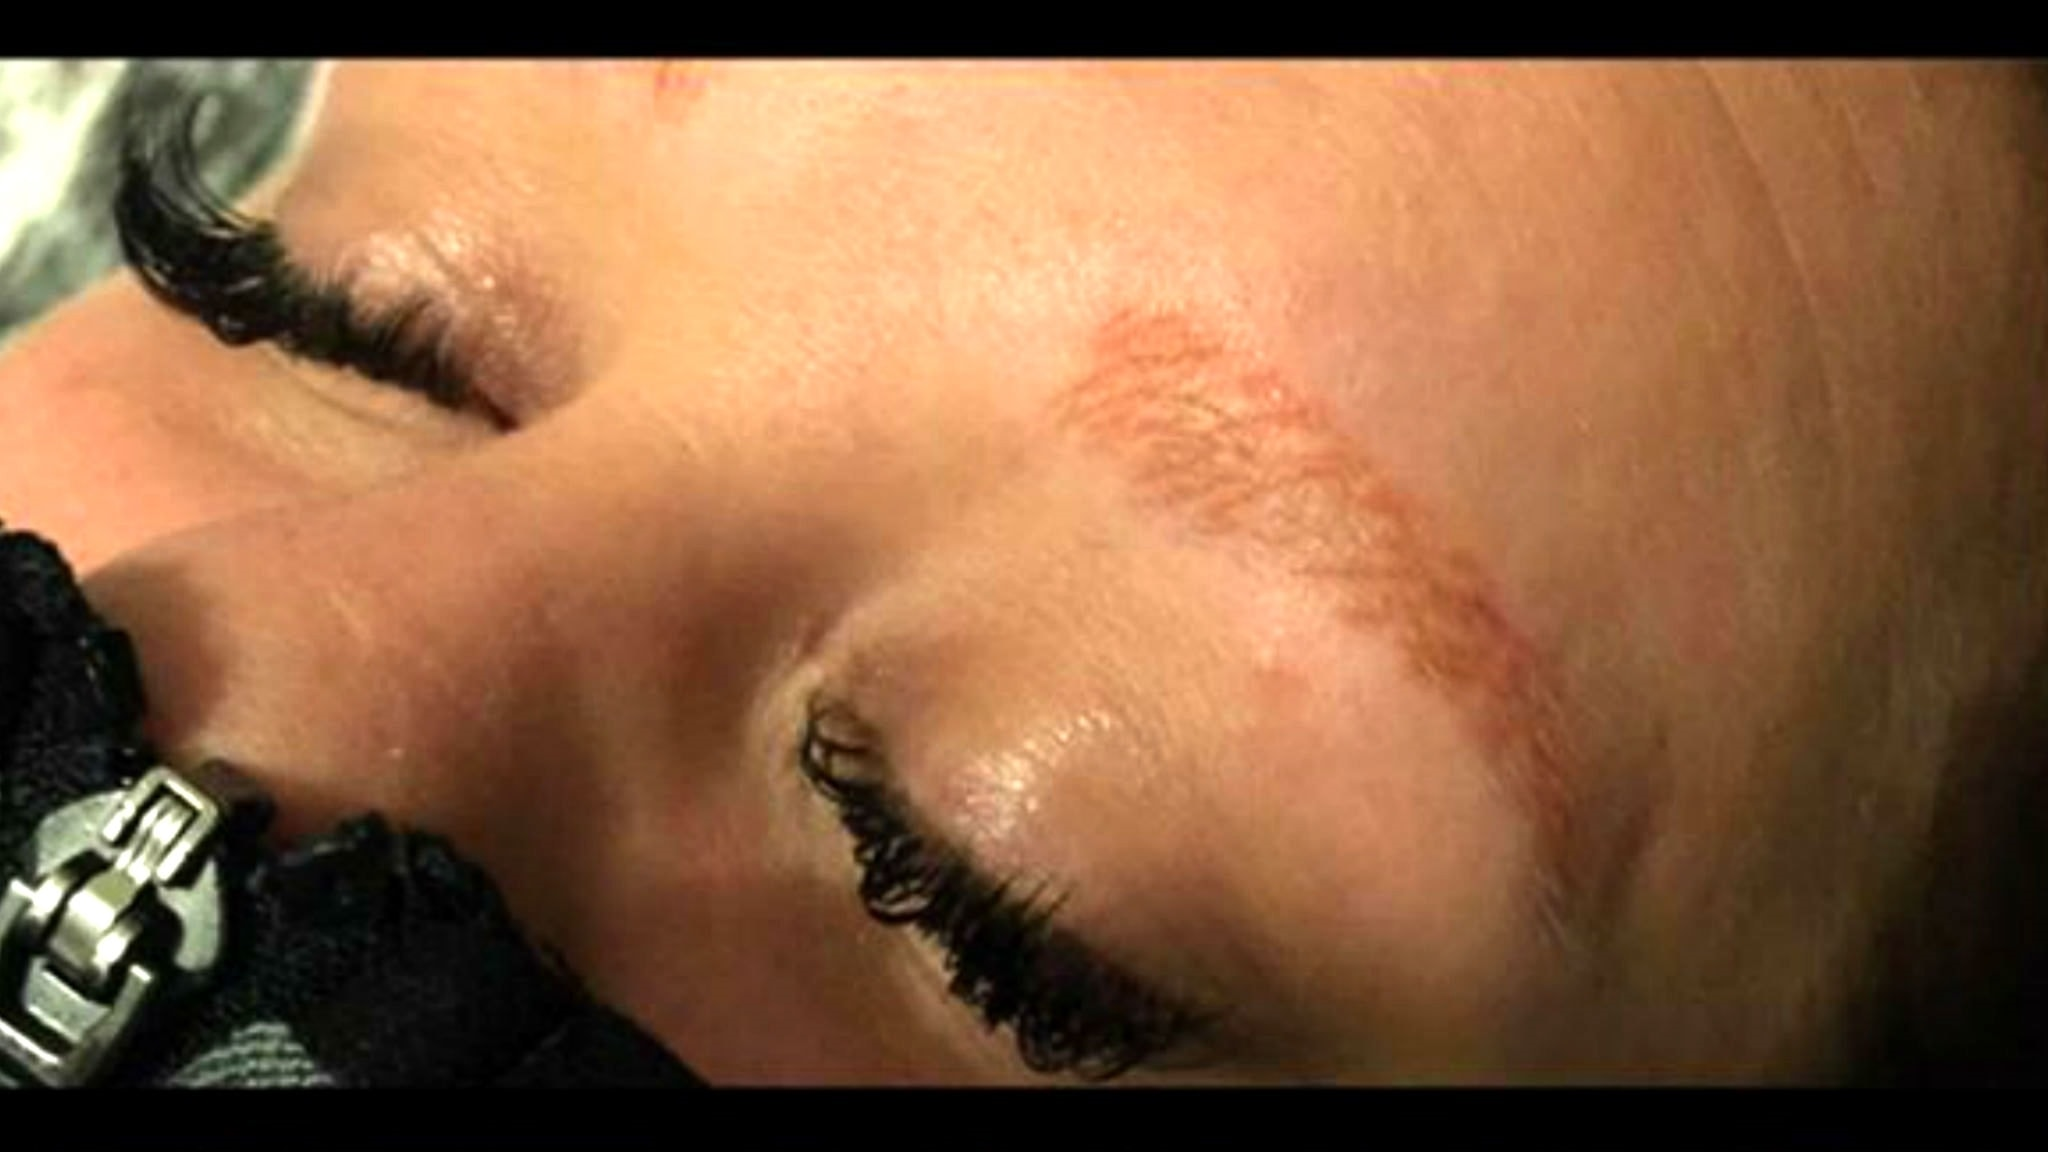 kosmetisk tatuering dalarna